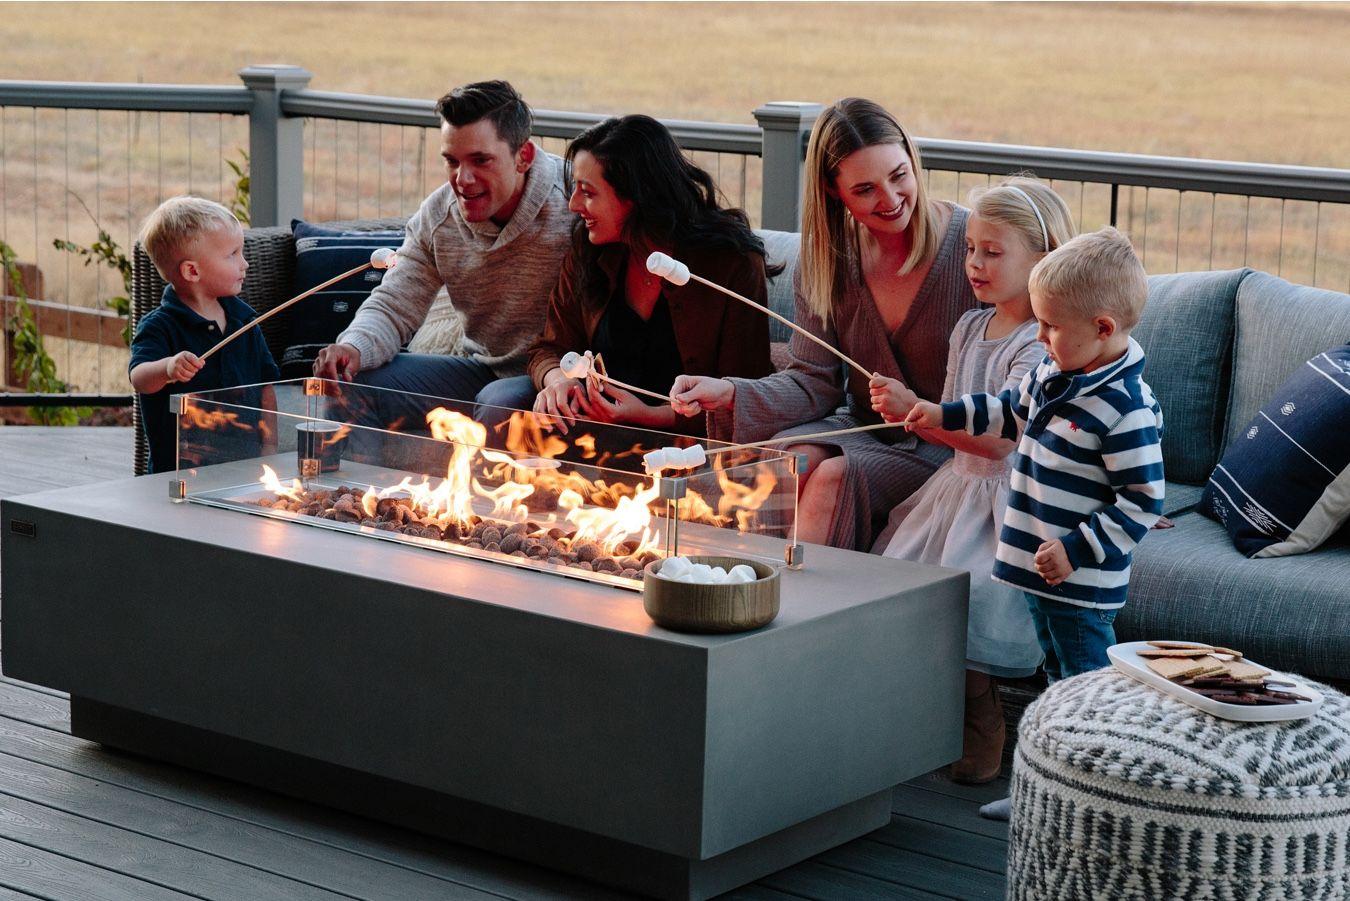 Family making smore's in backyard bonfire